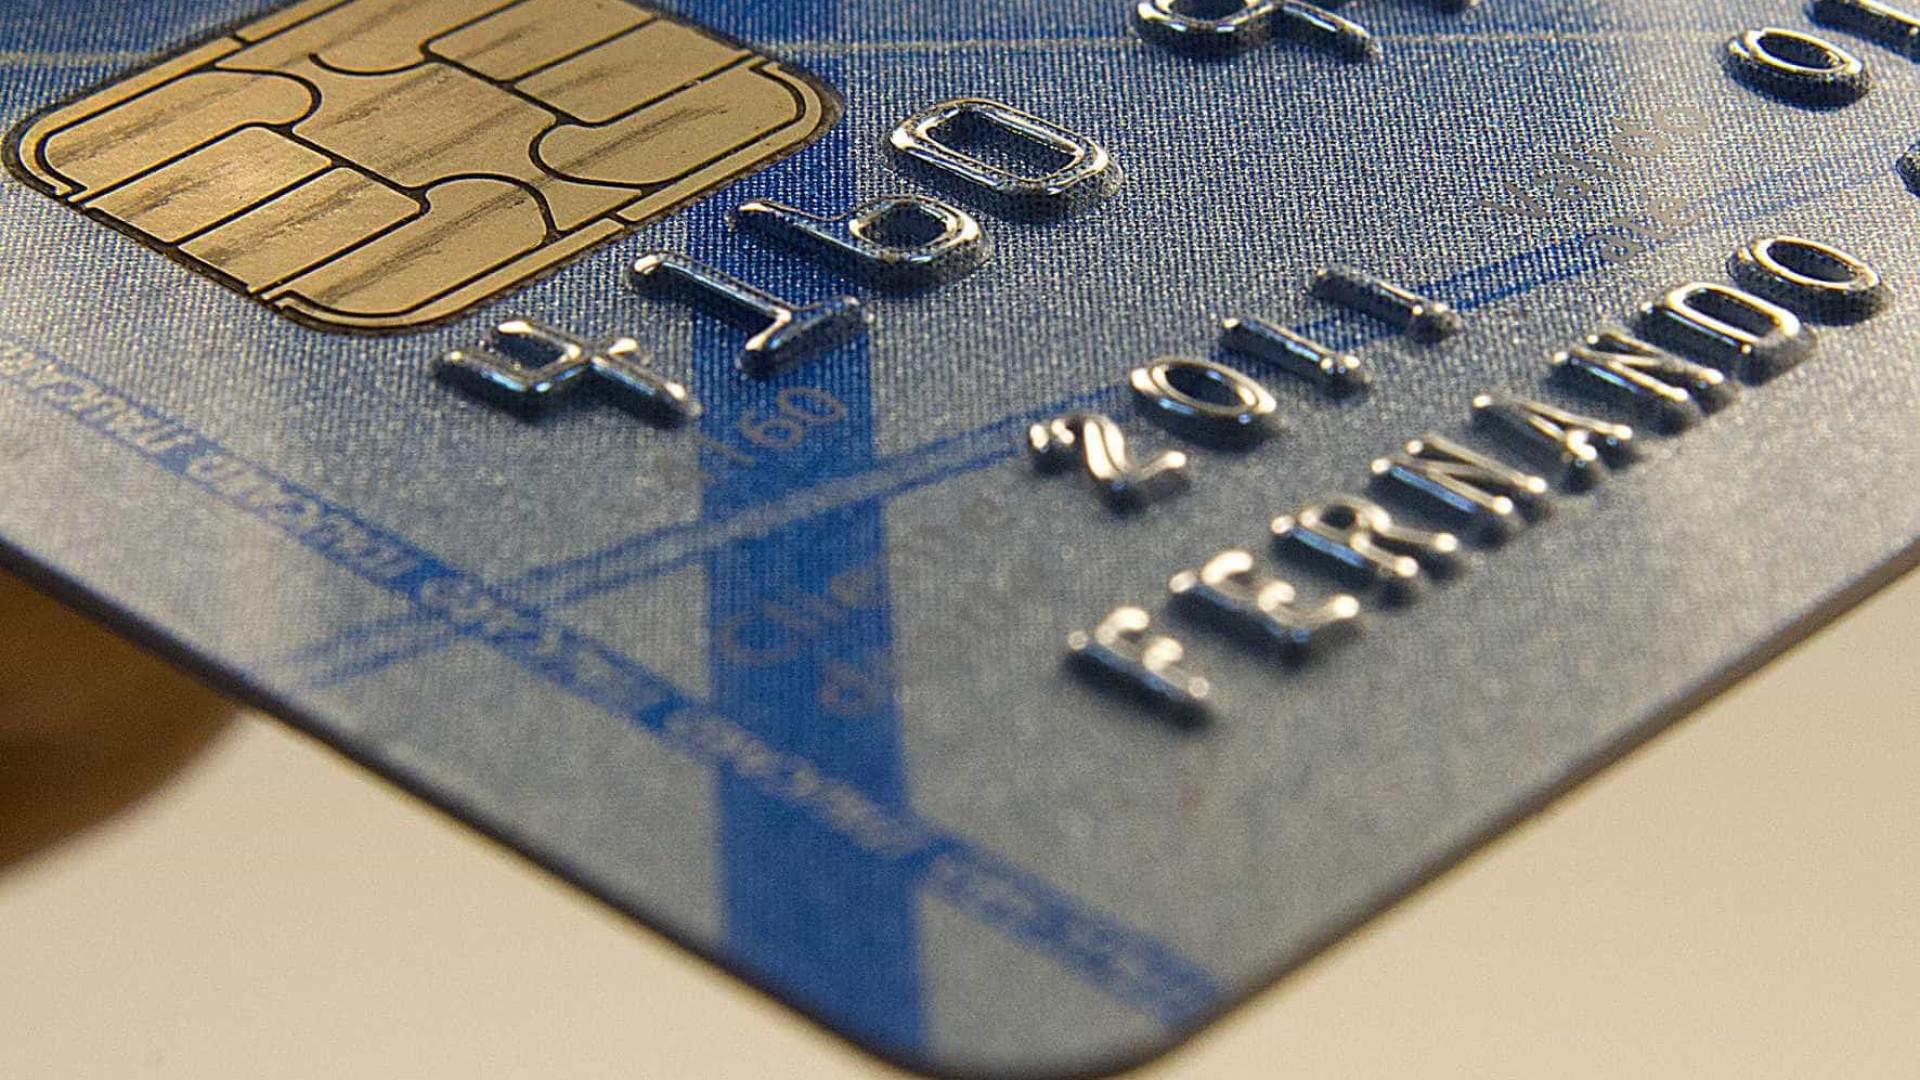 Serasa realiza mutirão para inadimplente renegociar dívida